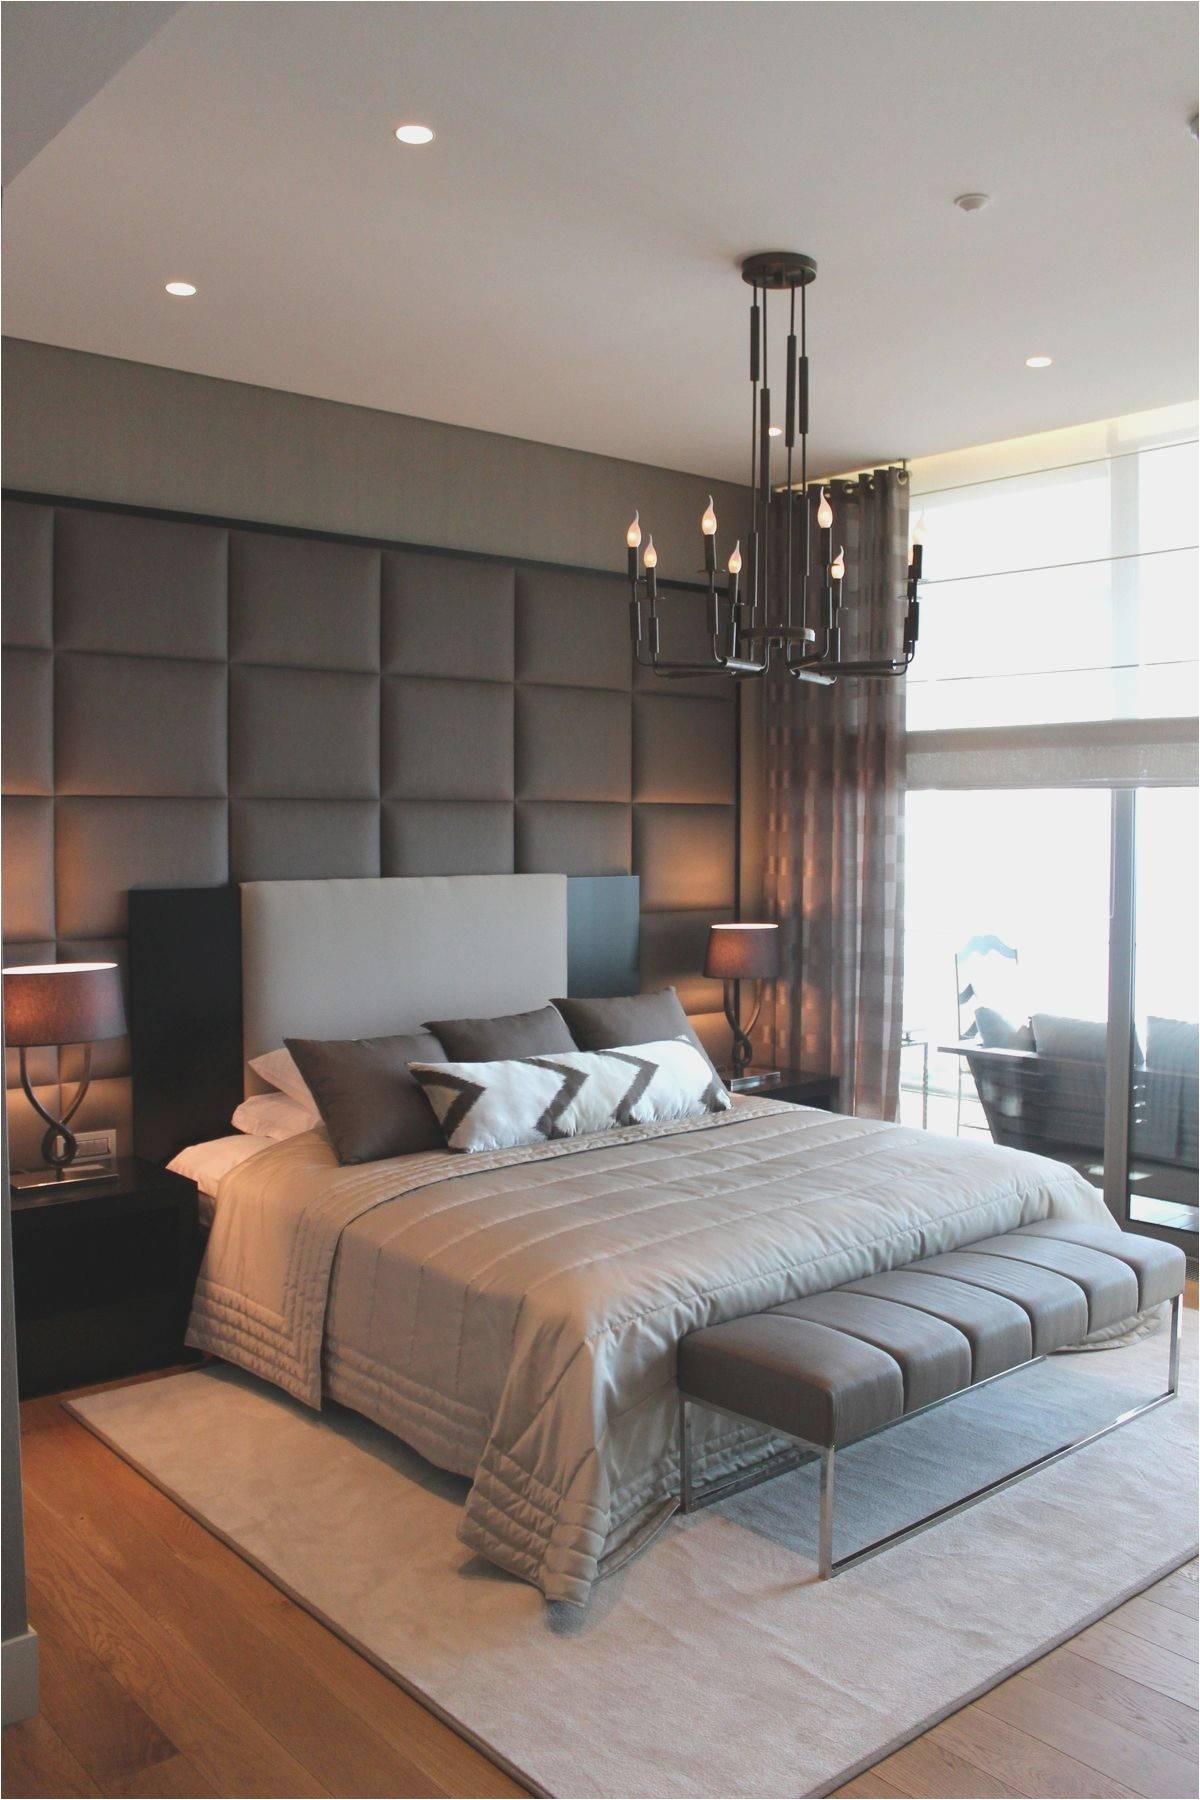 Decor Ideas For Bedroom Bradshomefurnishings